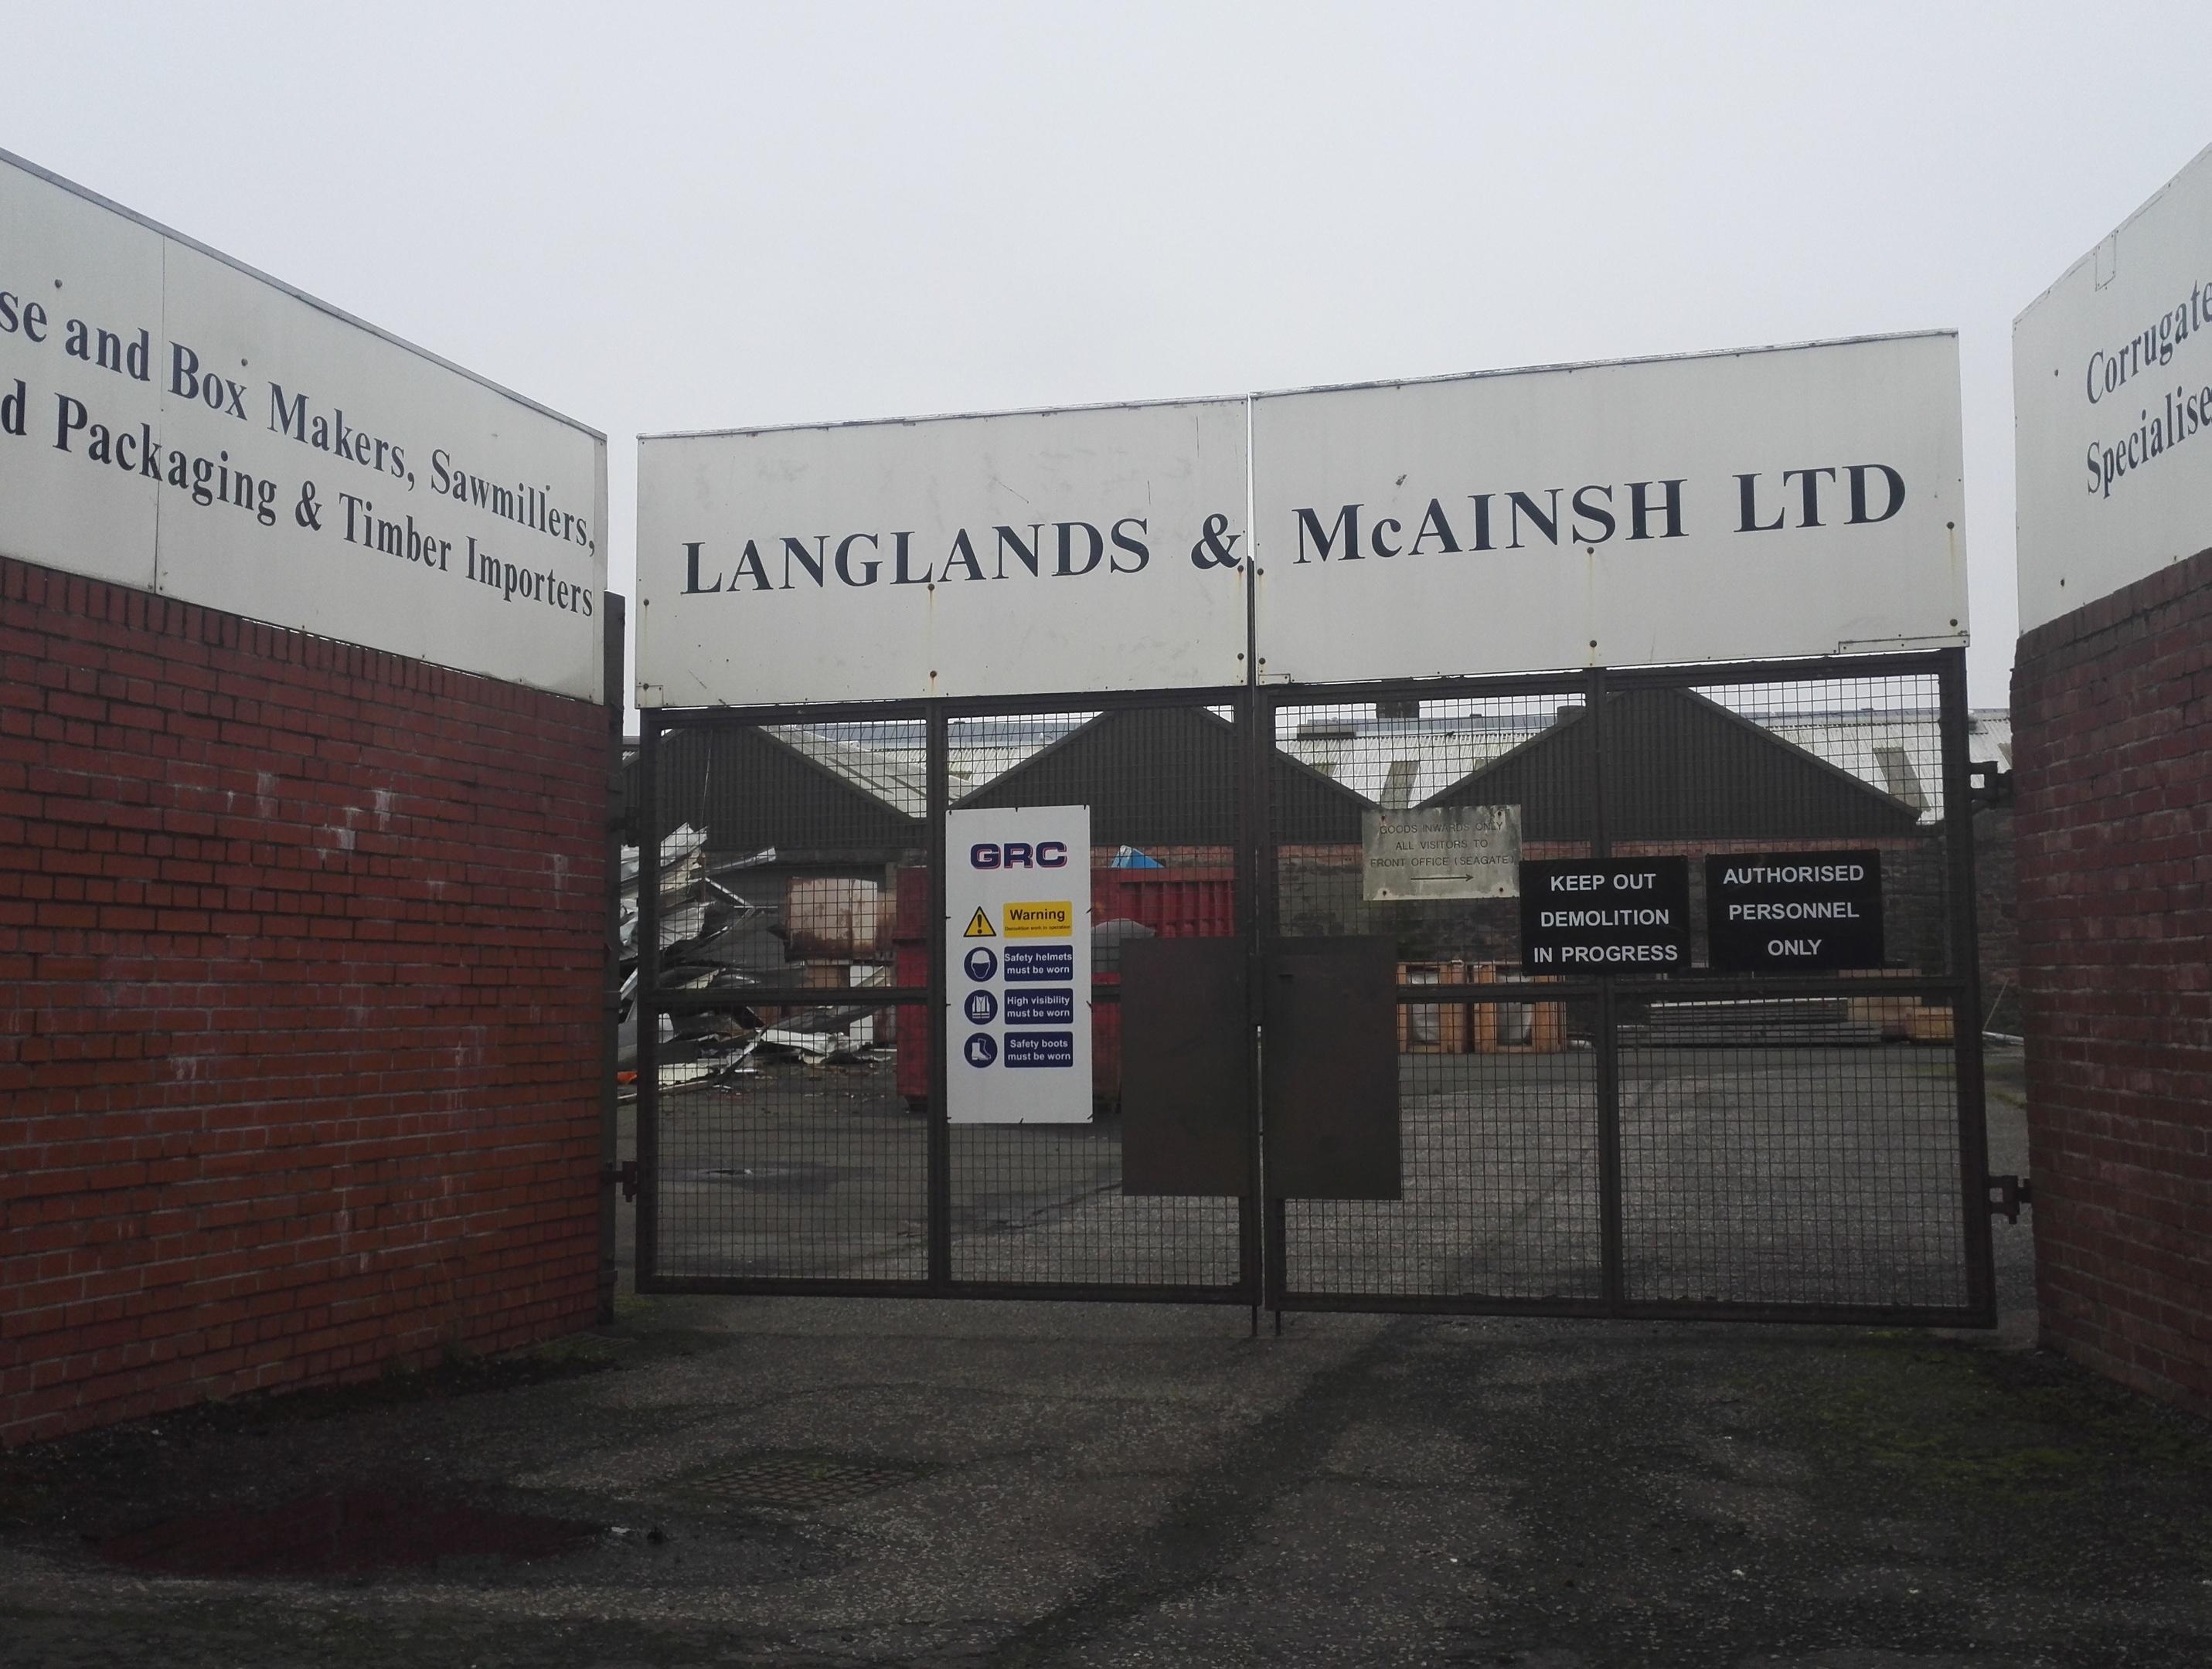 The locked gates at Langlands & McAinsh.